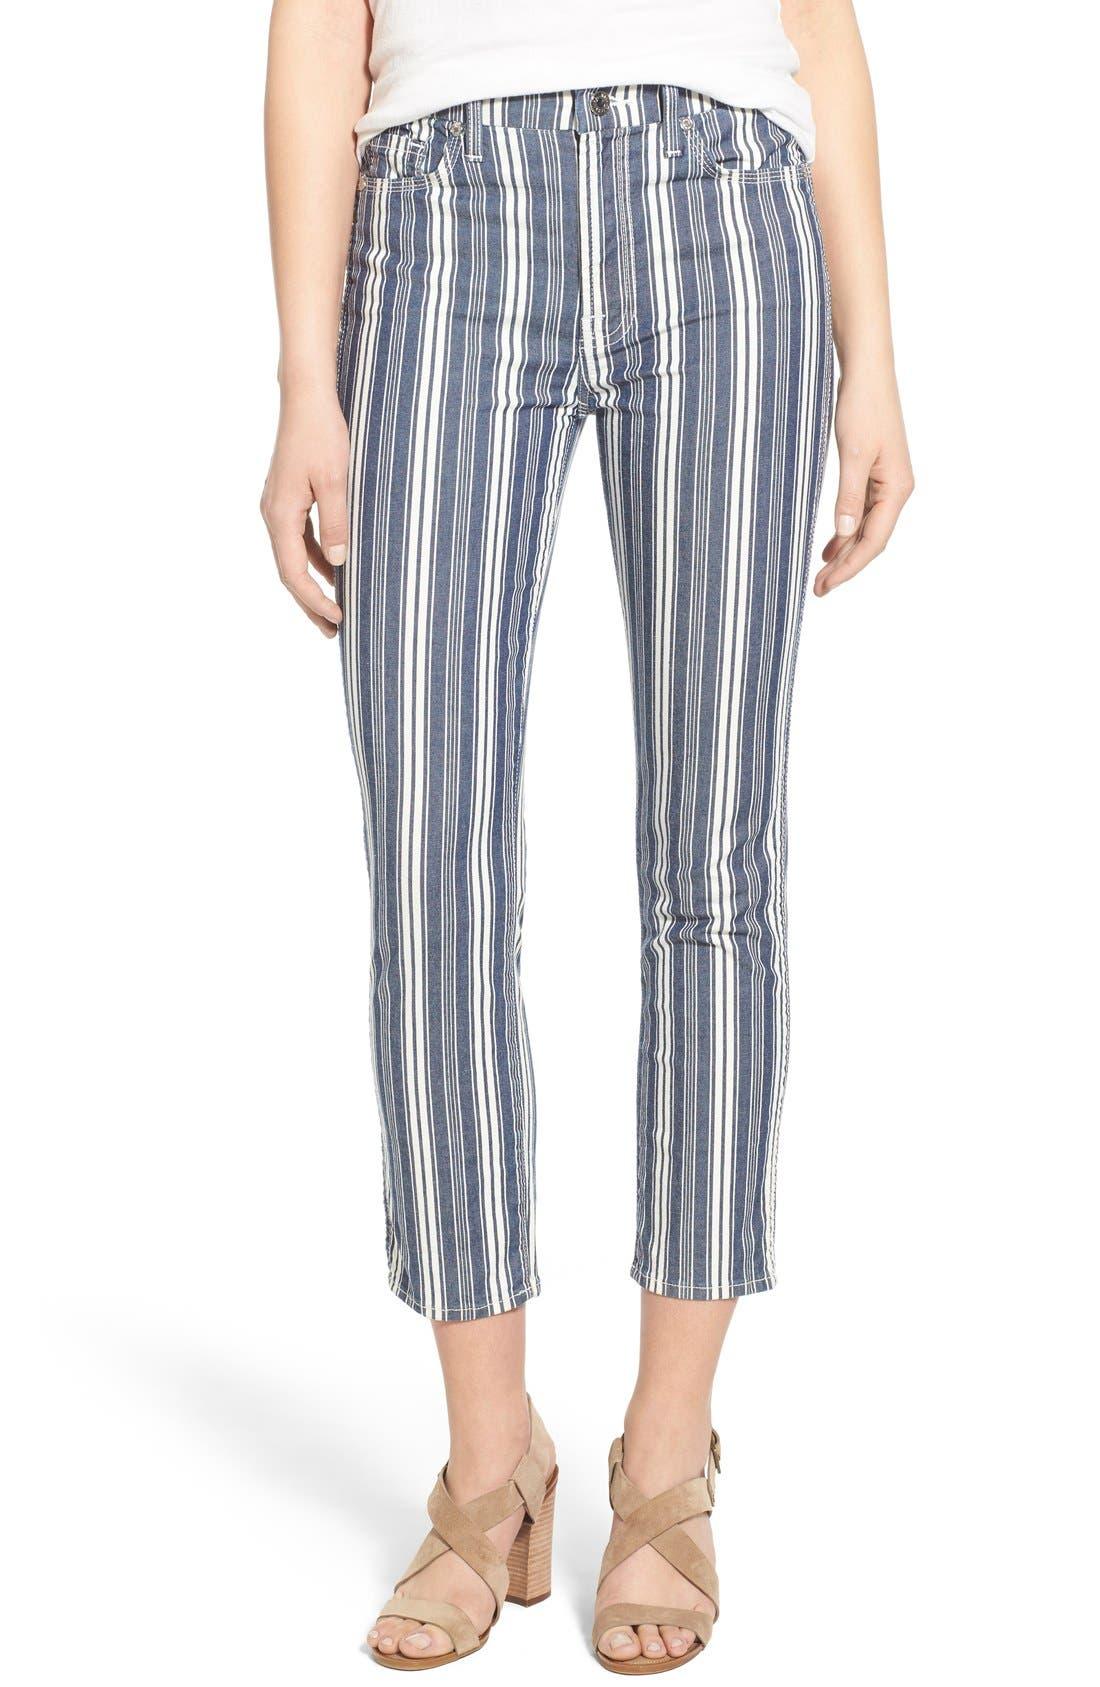 Alternate Image 1 Selected - 7 For All Mankind® Ankle Straight Leg Jeans (Indigo Stripe)